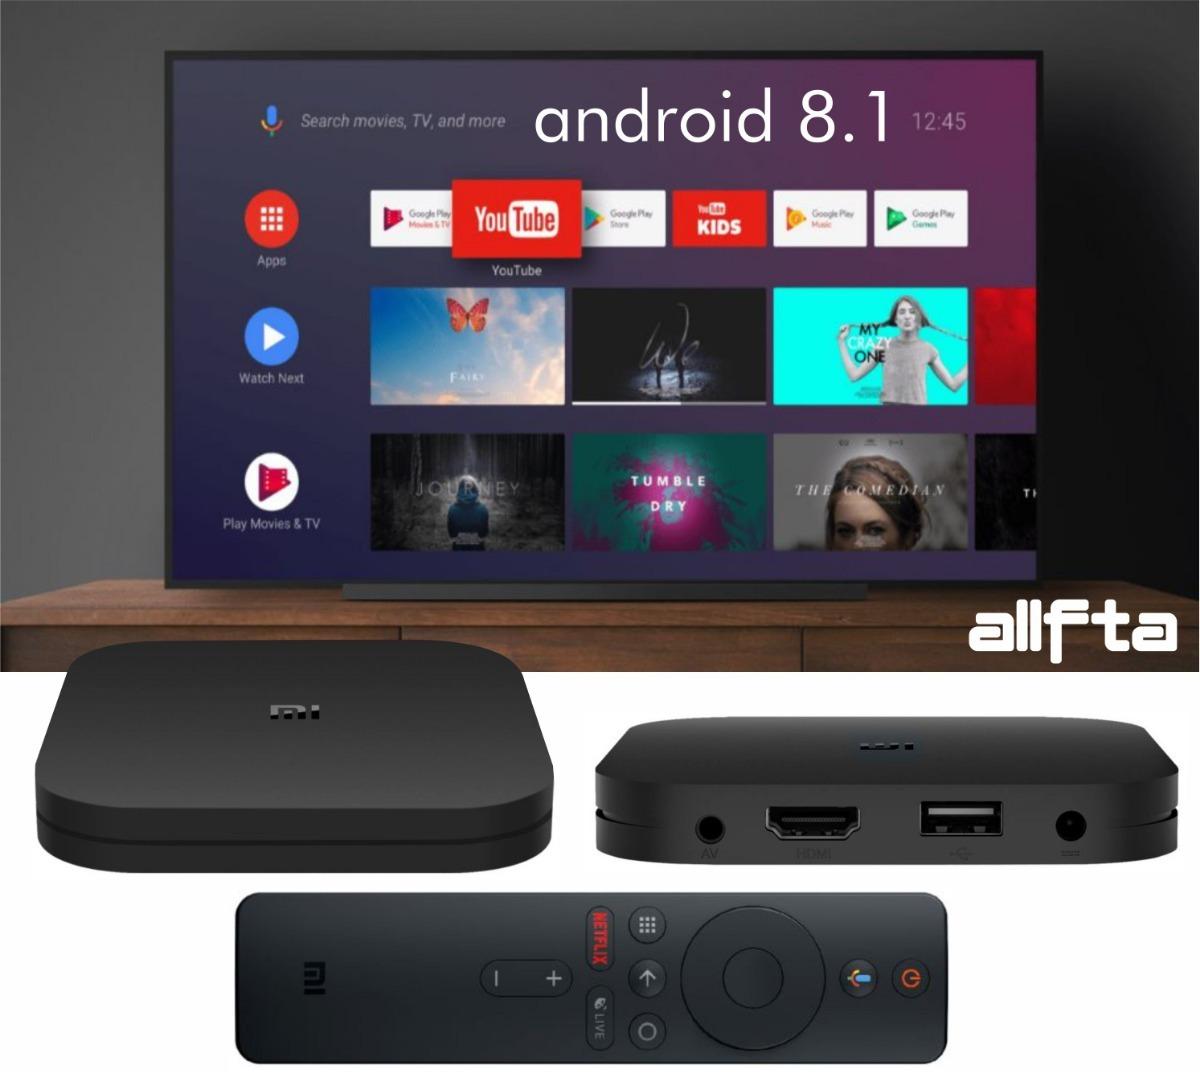 Xiaomi Mi Box S 4k Google Assistant Android Tv 8 1